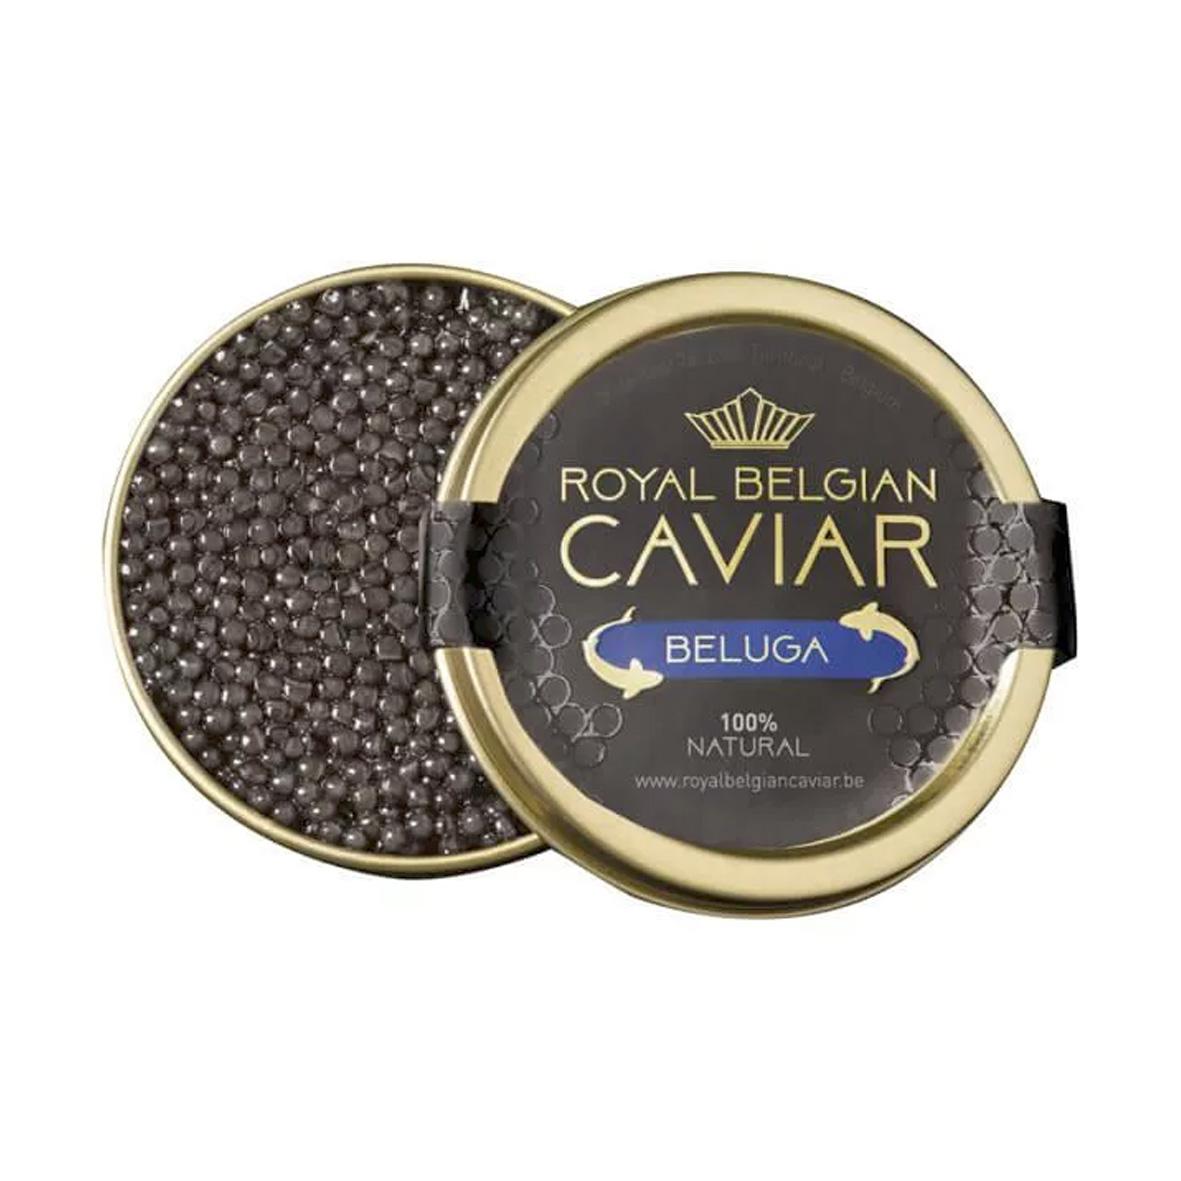 Caviar Royal Belgian Caviar - Beluga